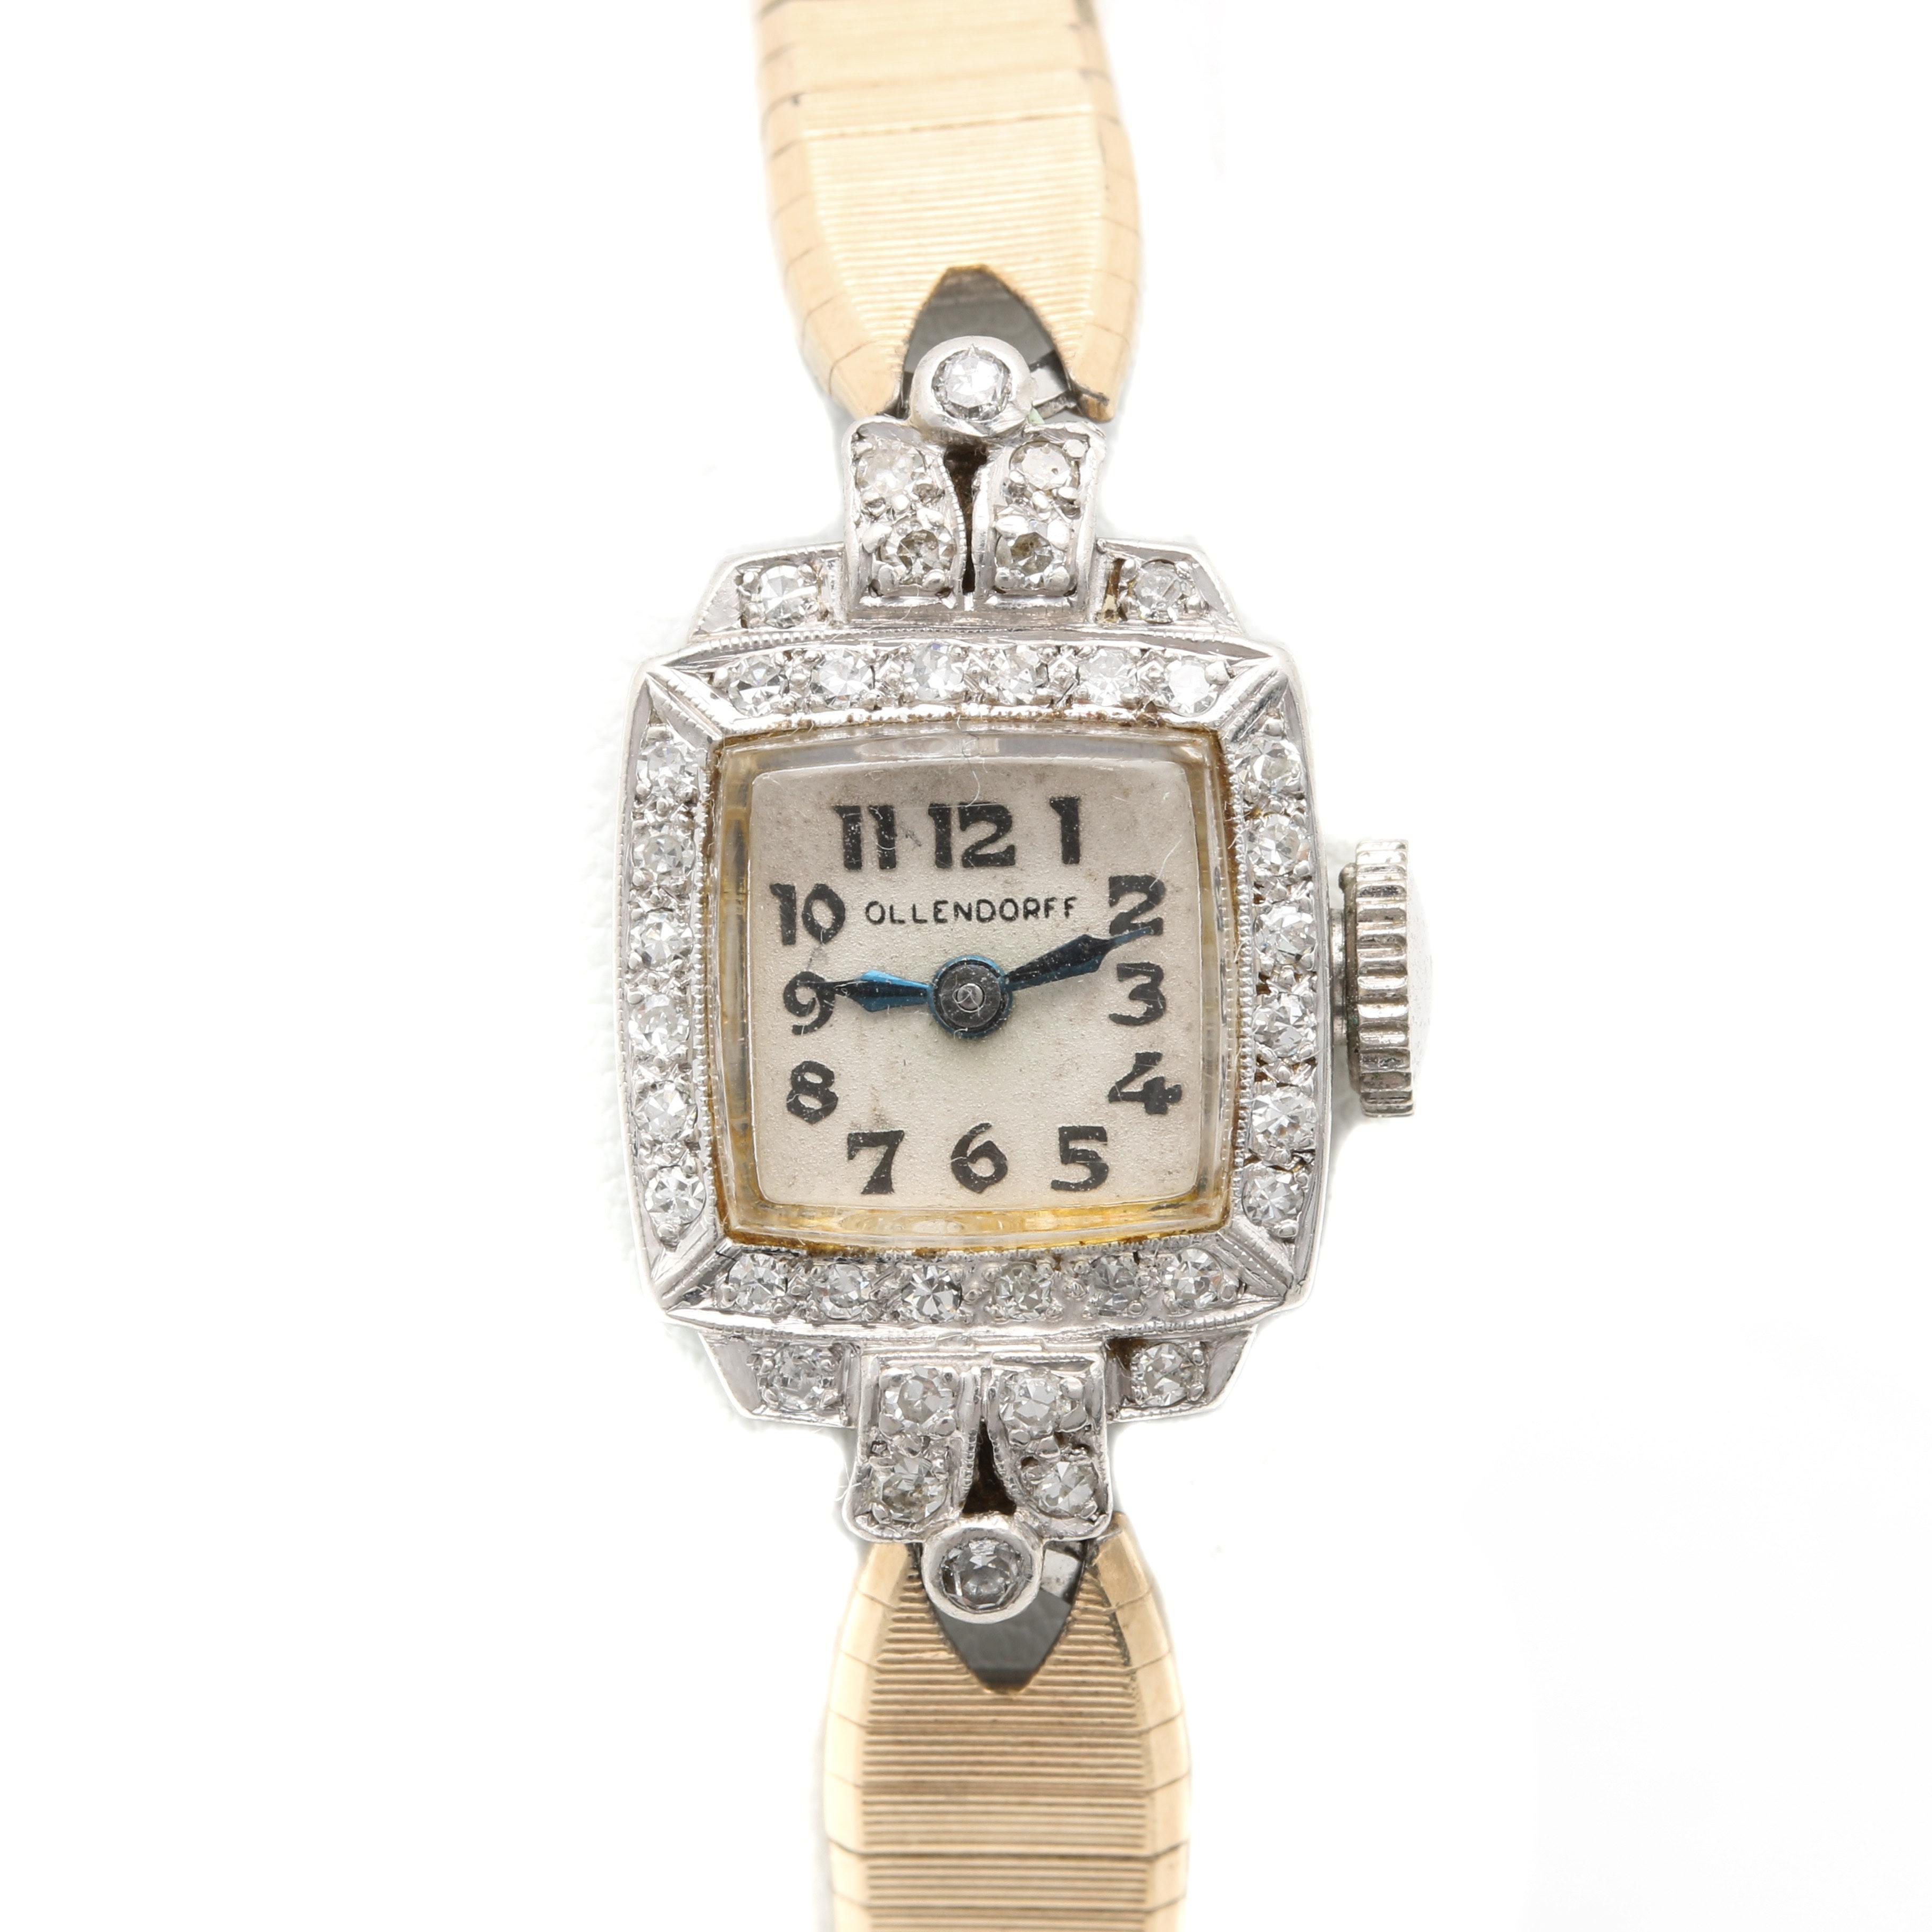 Ollendorf Platinum and Diamond Wristwatch